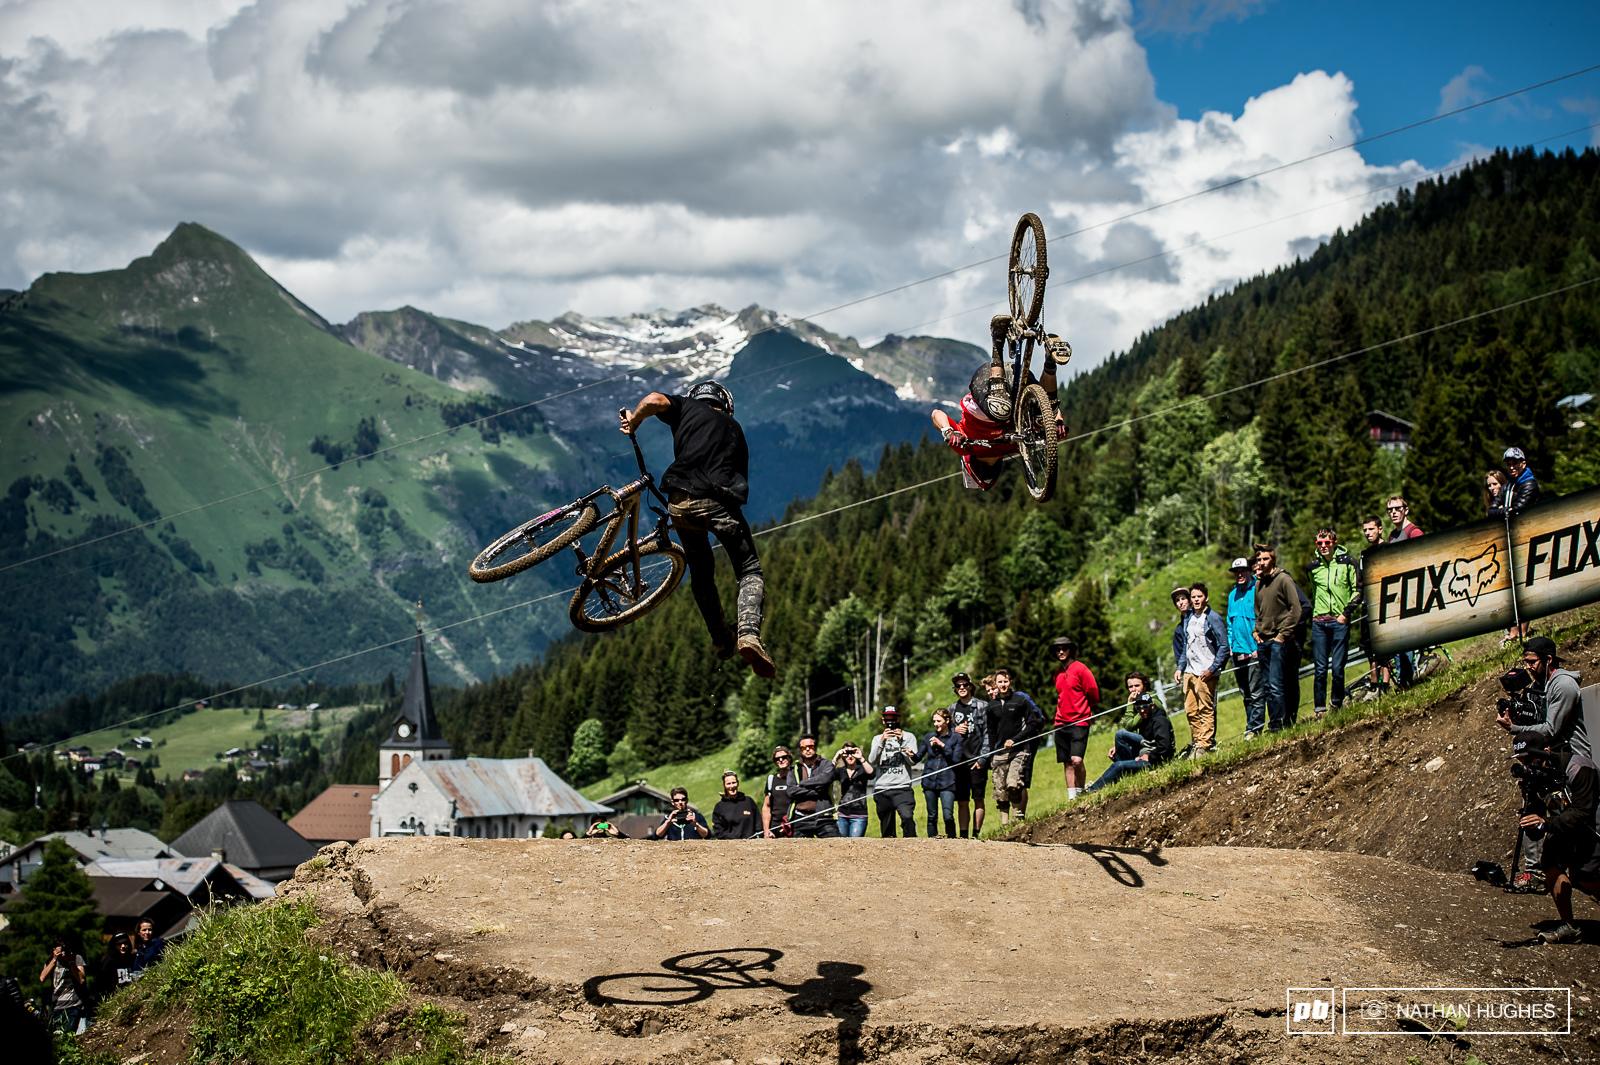 Louis Reboul tail-whips while Adrien Loron flips.